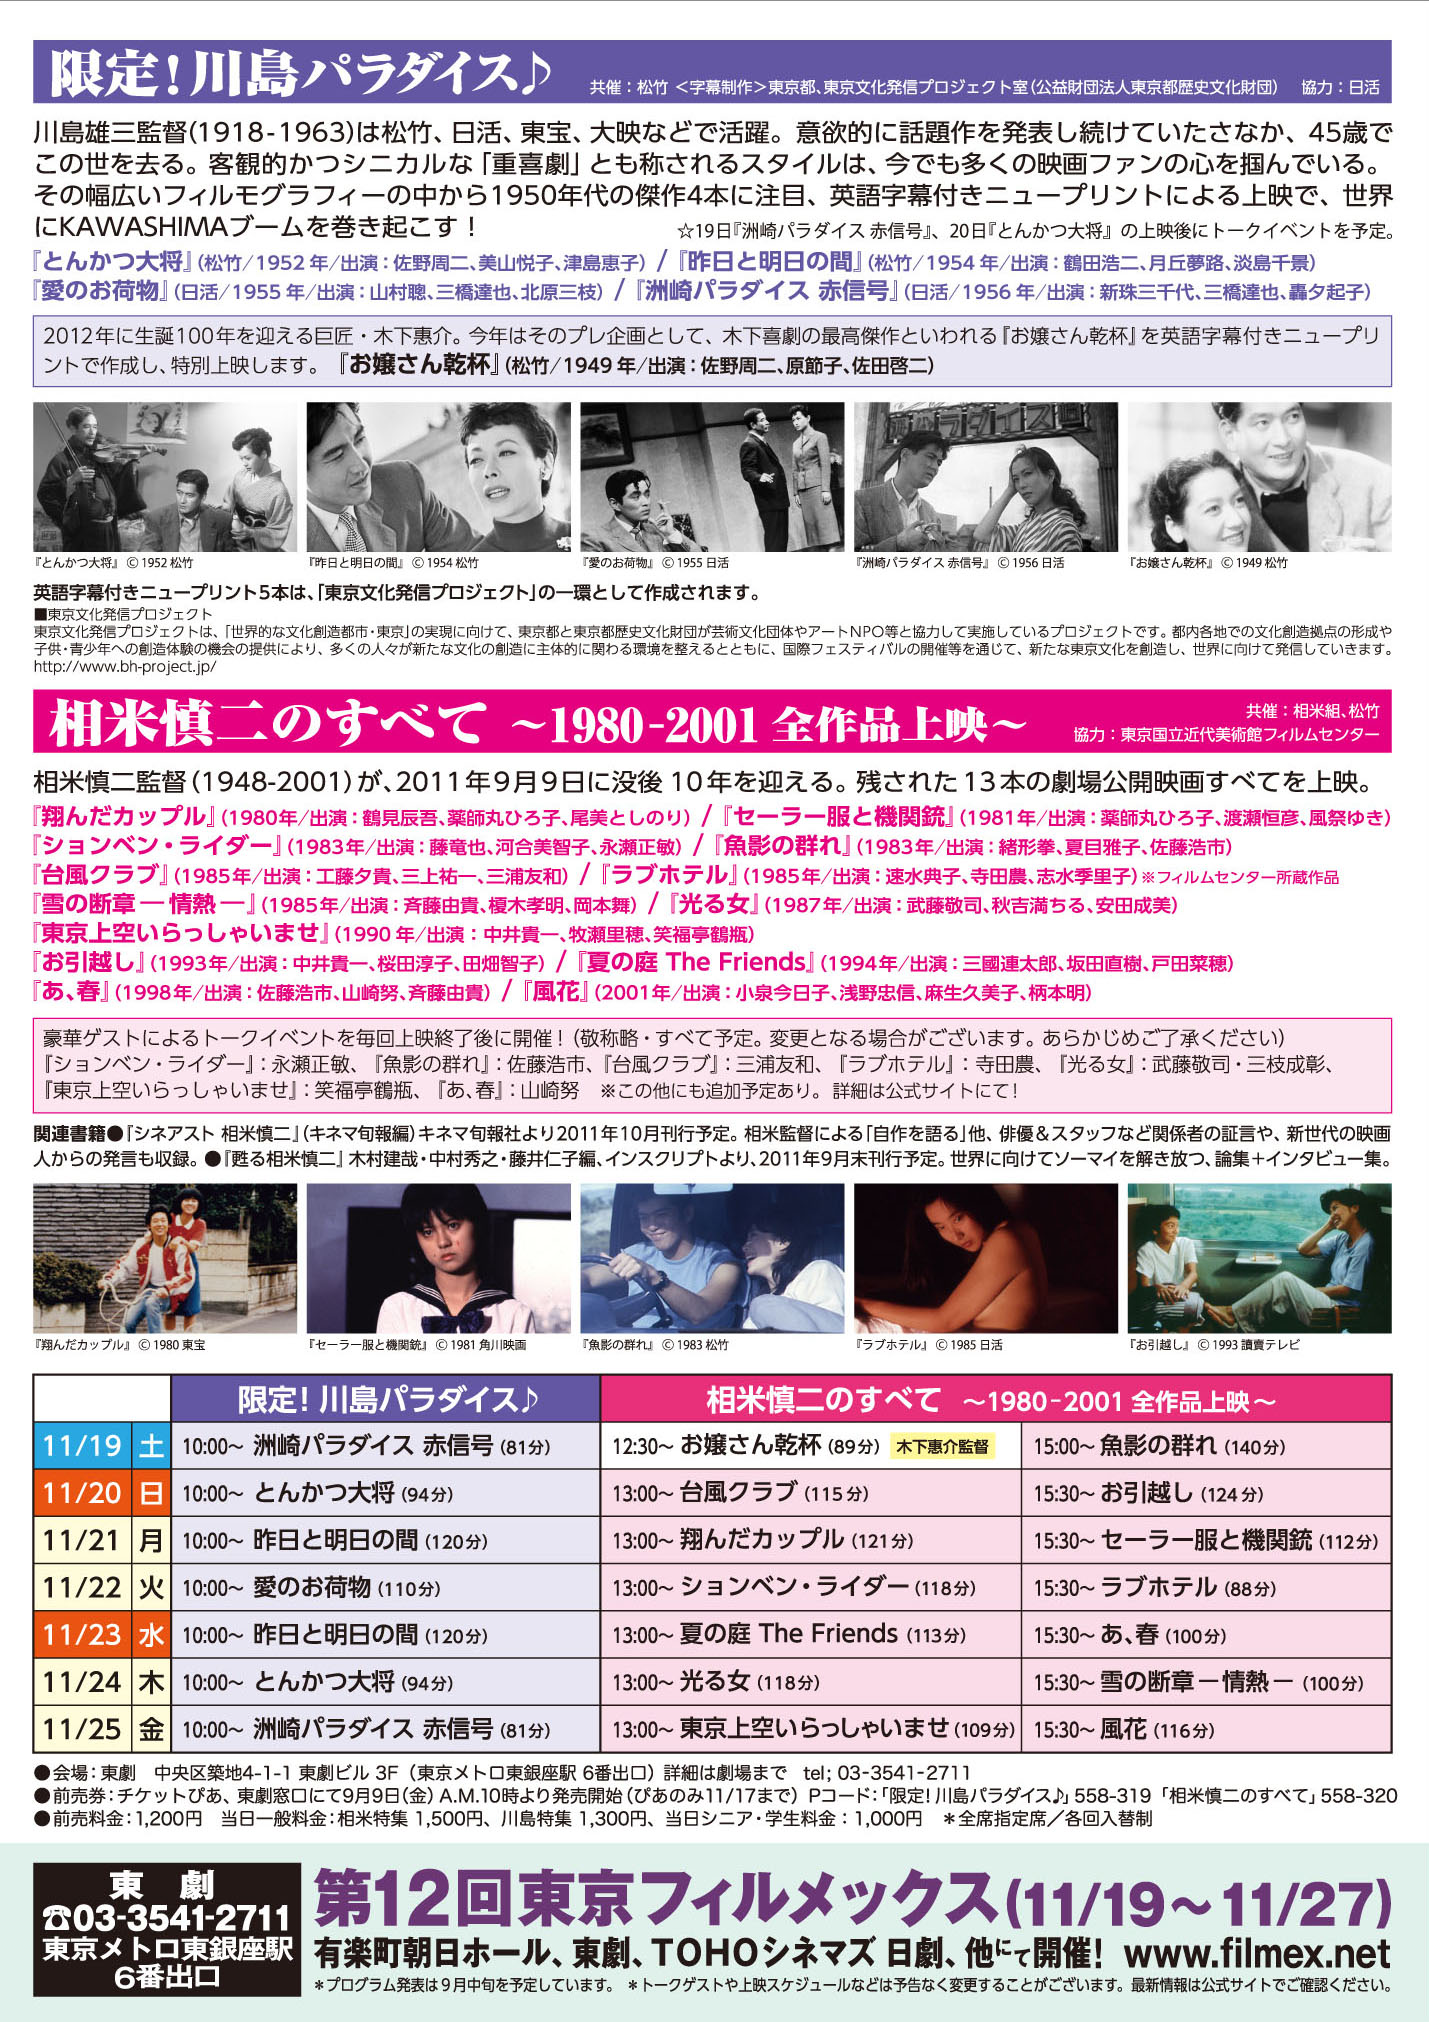 http://filmex.net/news/KawashimaSomaiU.jpg